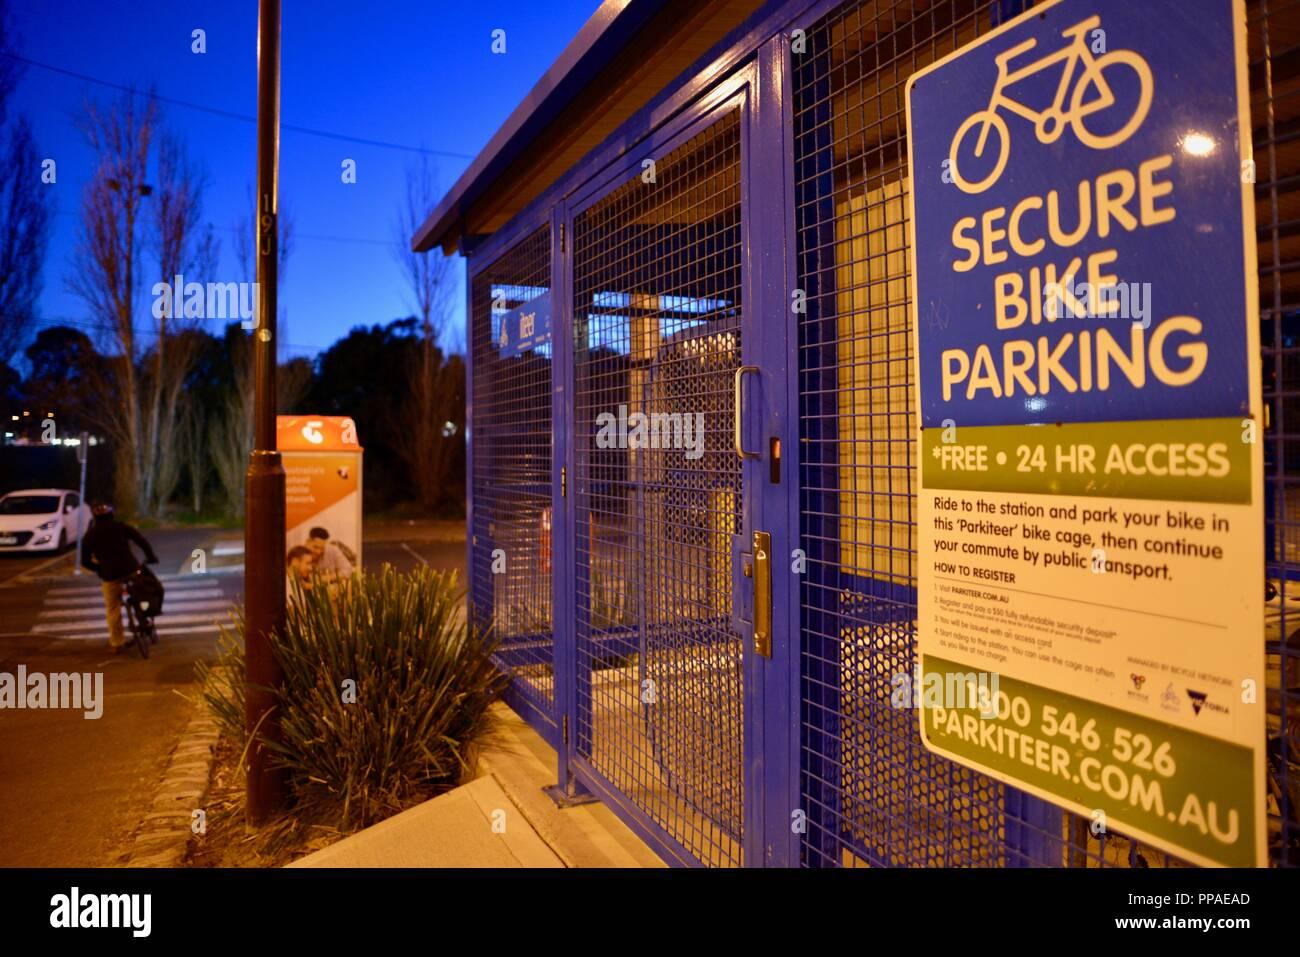 Secure bike parking facility, Melbourne VIC, Australia - Stock Image